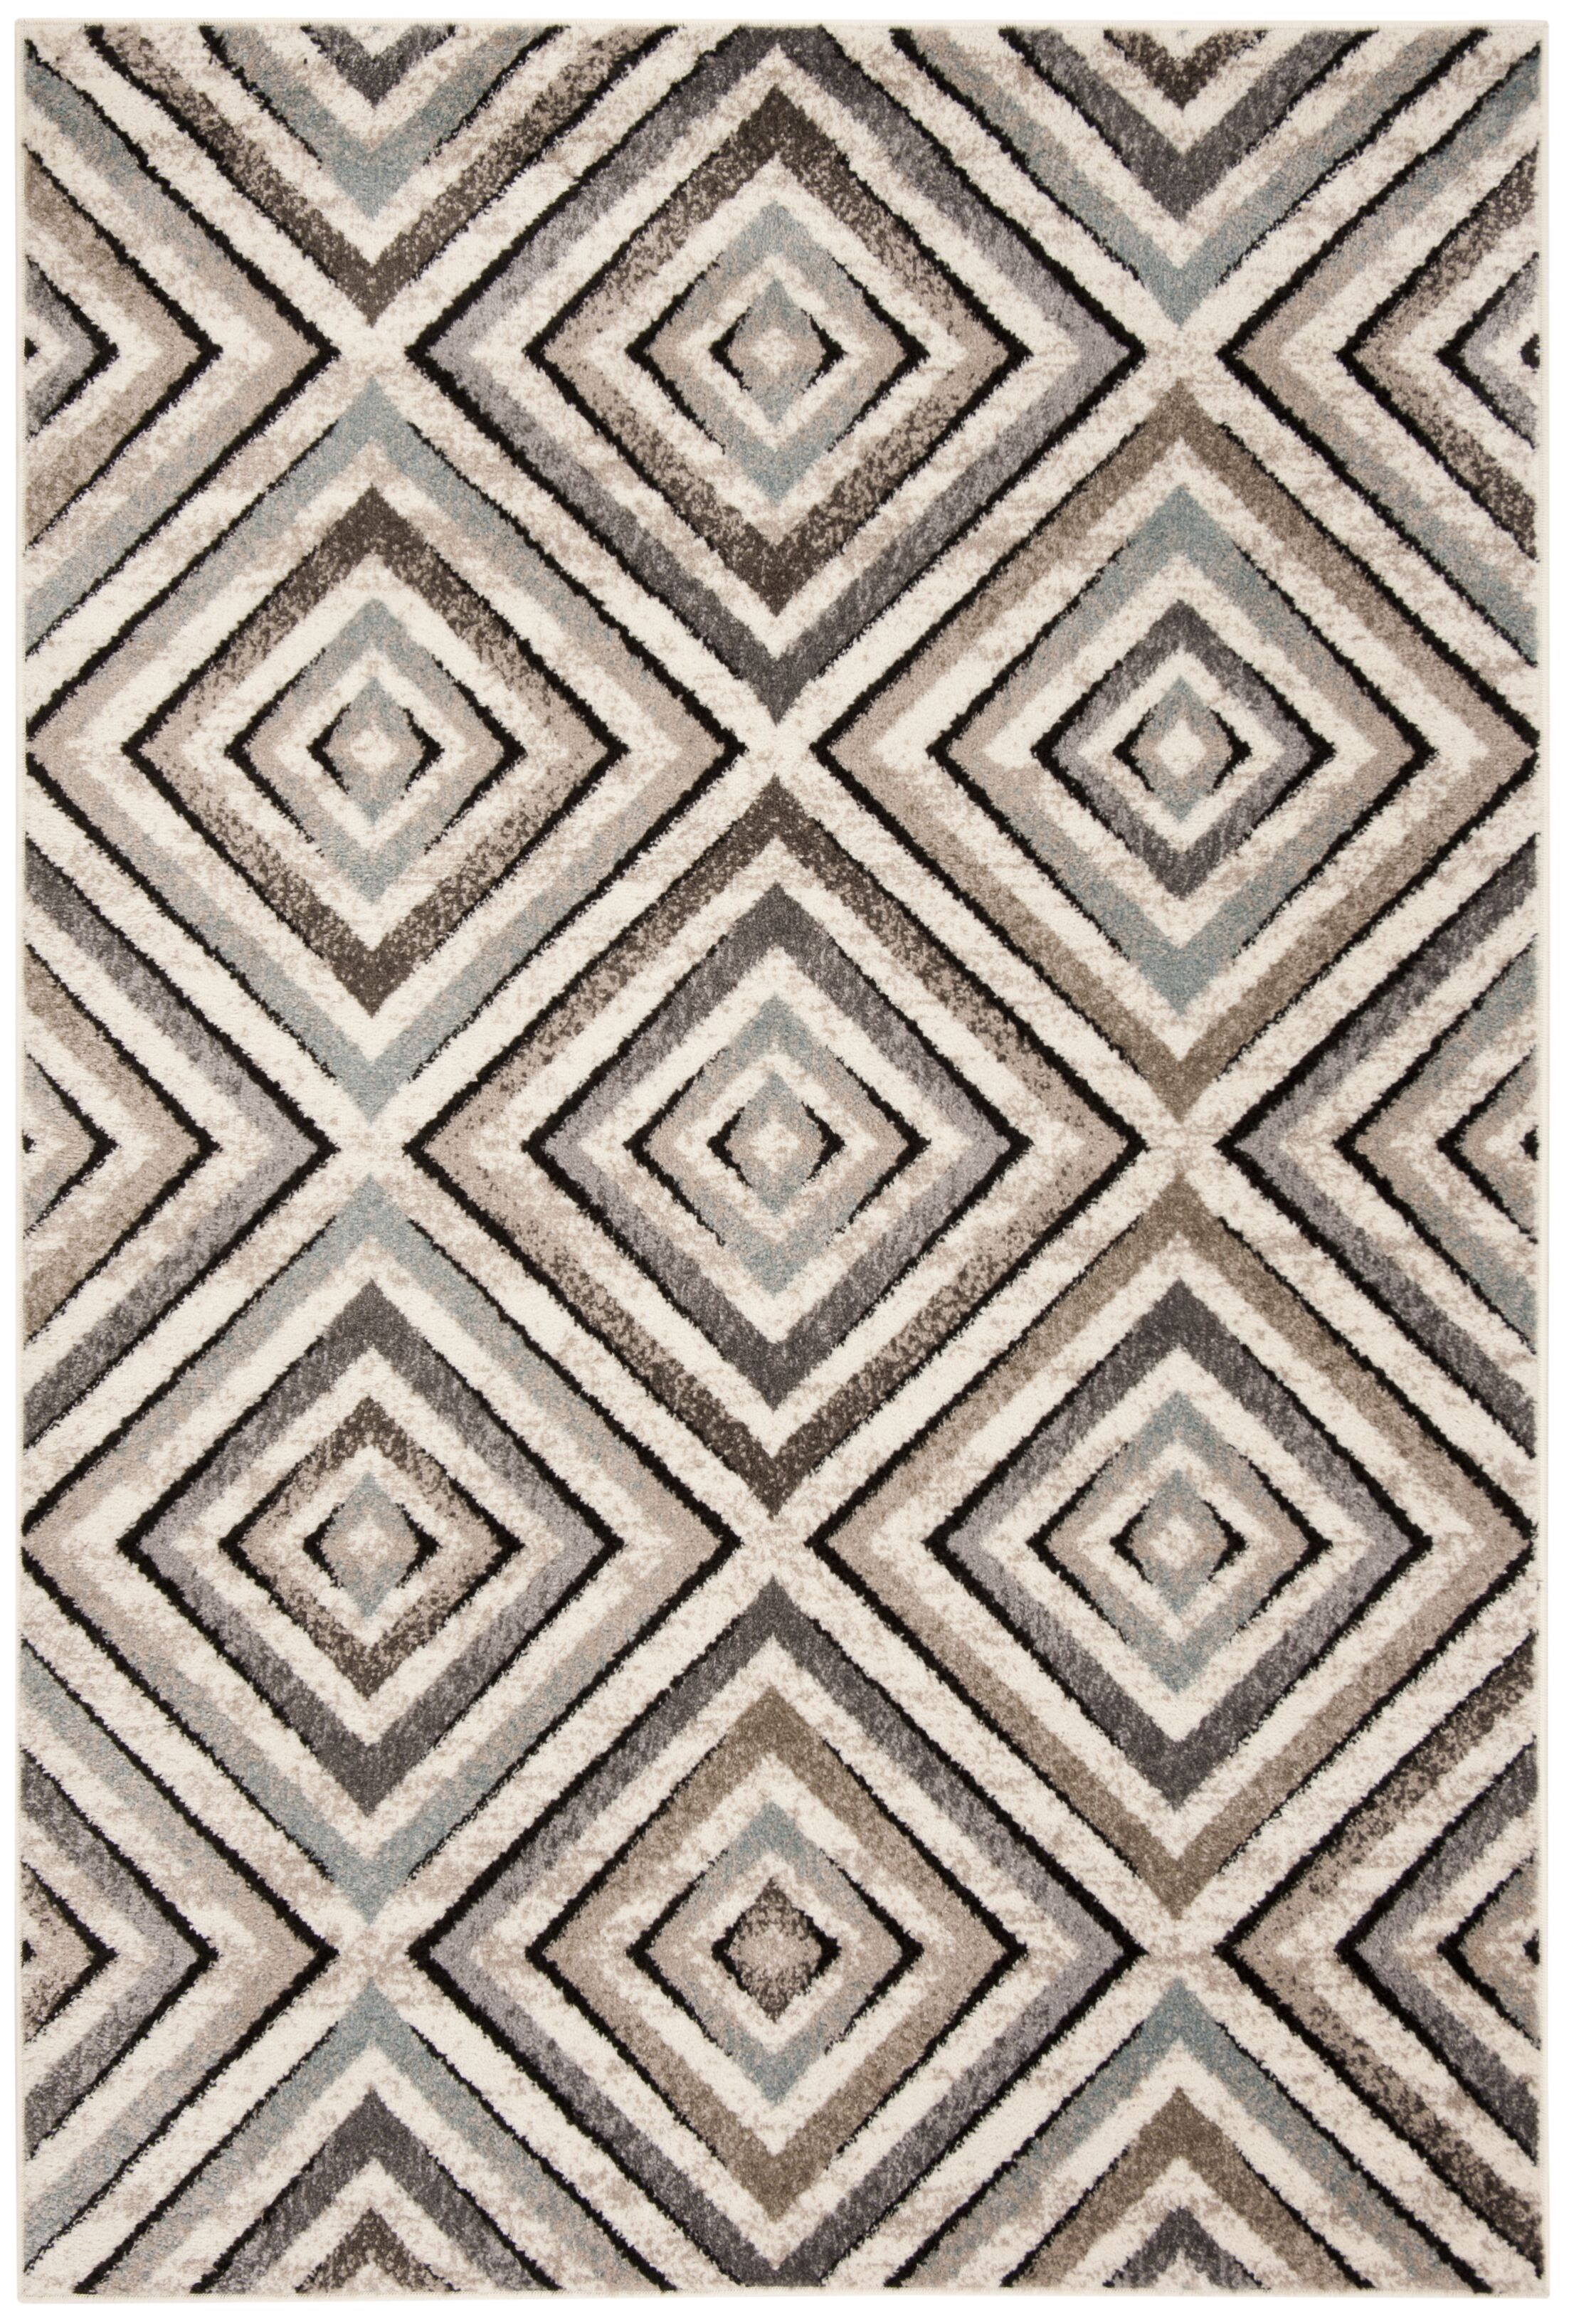 Alioth Cream/Beige Geometric Area Rug Rug Size: Rectangle 8' x 10'